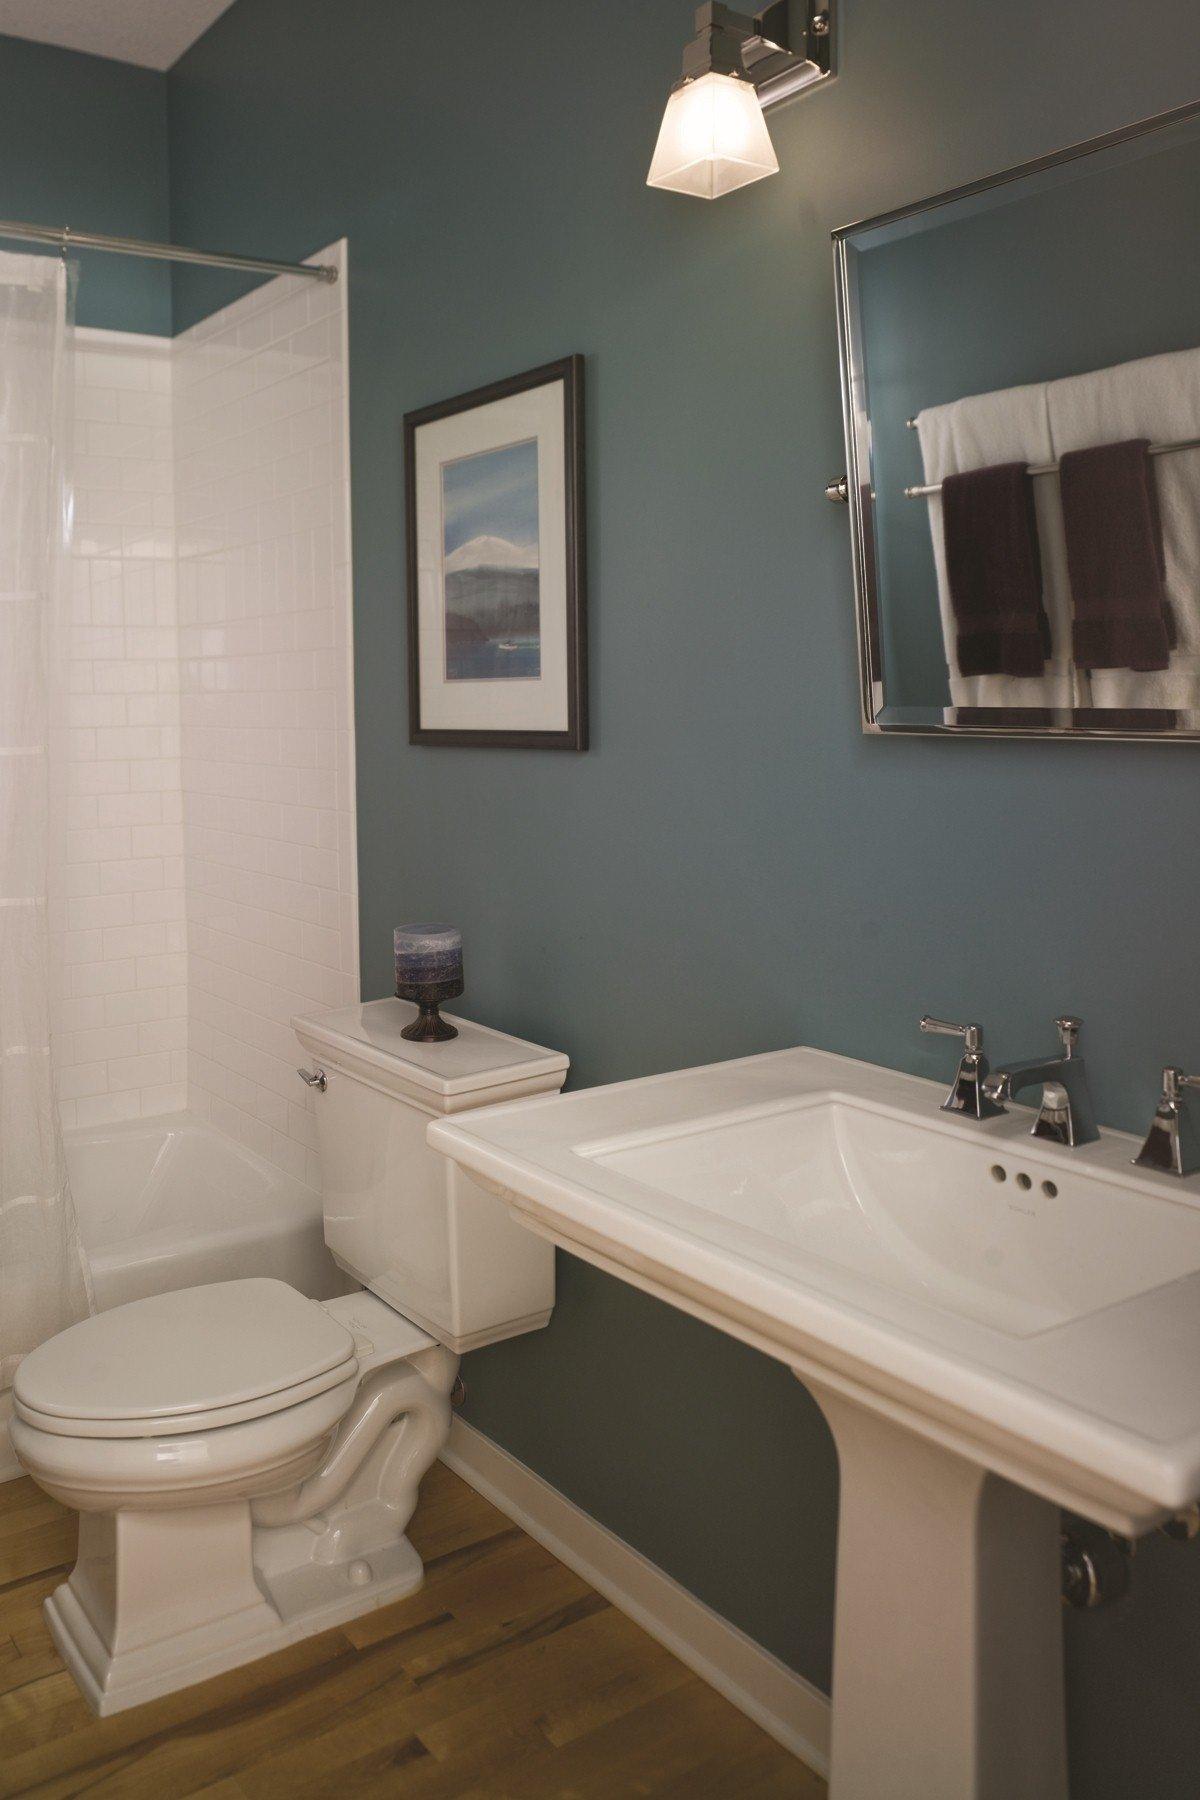 10 Cute Small Bathroom Ideas On A Budget best cheap bathroom ideas for small bathrooms with ideas for small 1